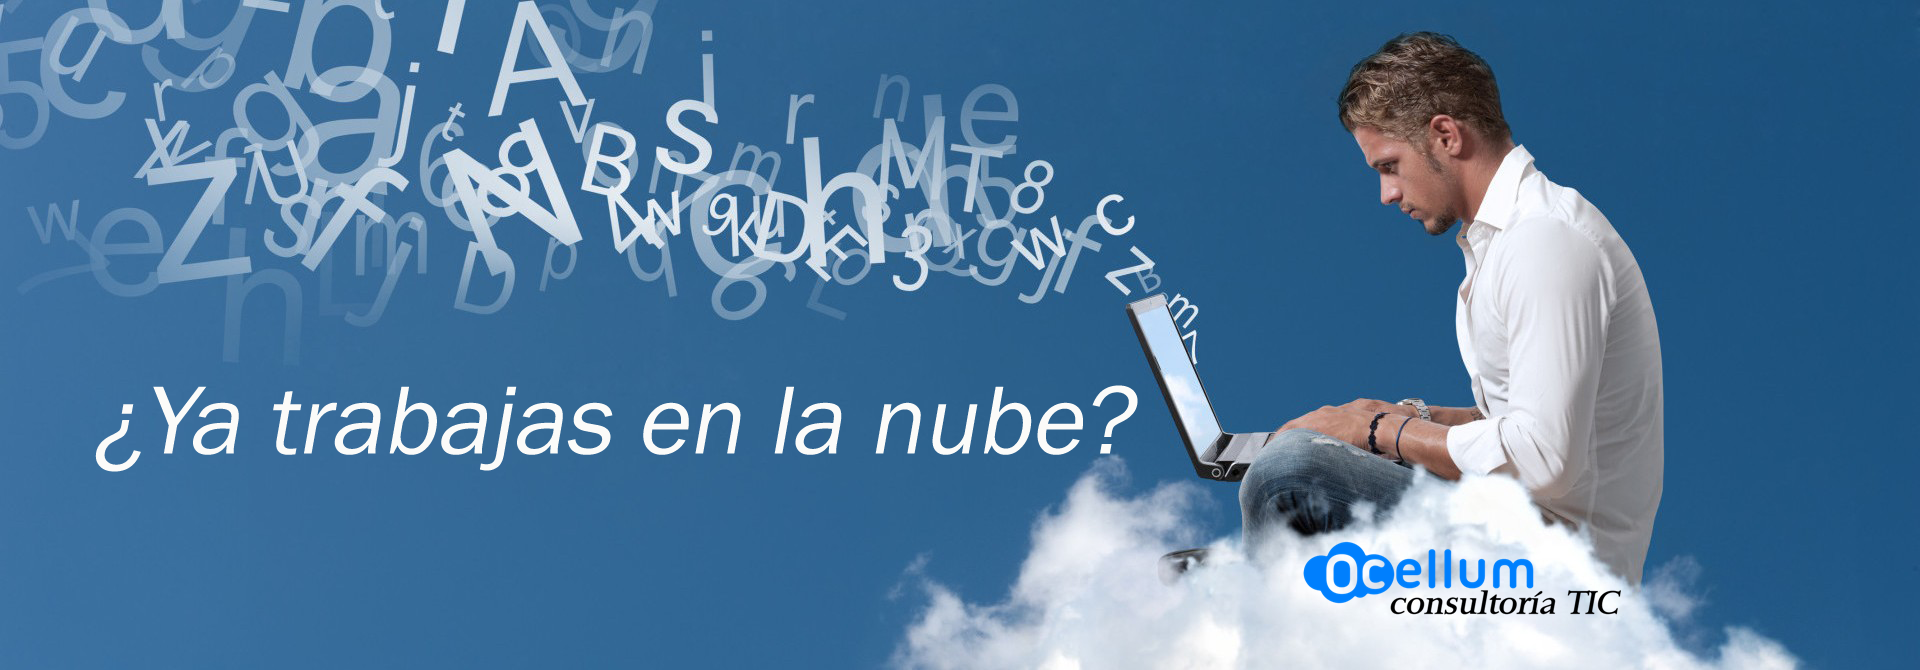 Ocellum CONSULTORIA INFORMATICA consultoria TIC en Barcelona Cloud computing